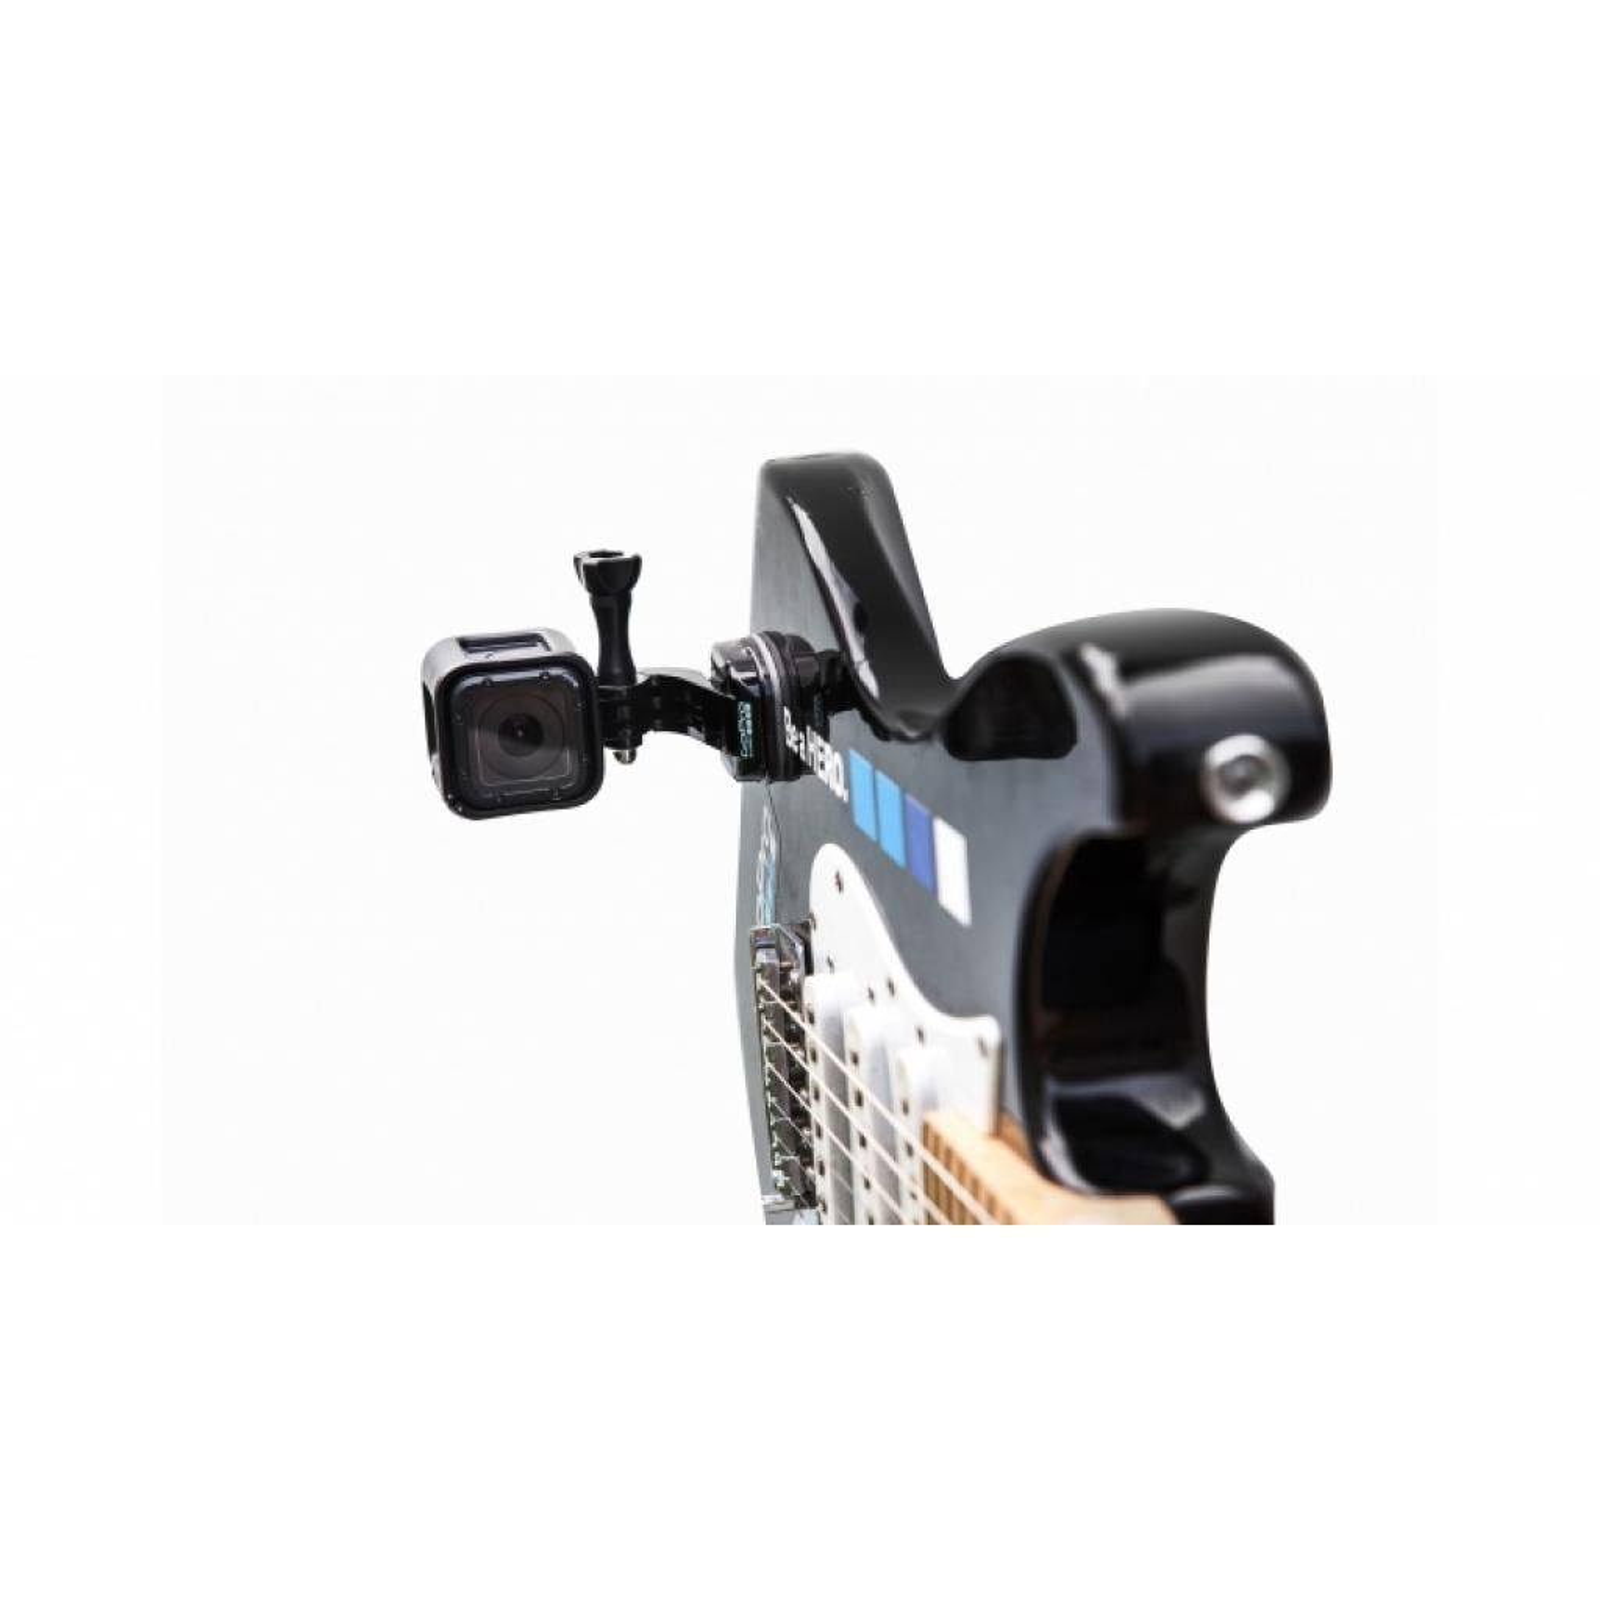 Аксессуар к экшн-камерам GoPro Removable instrument mounts (AMRAD-001) изображение 3